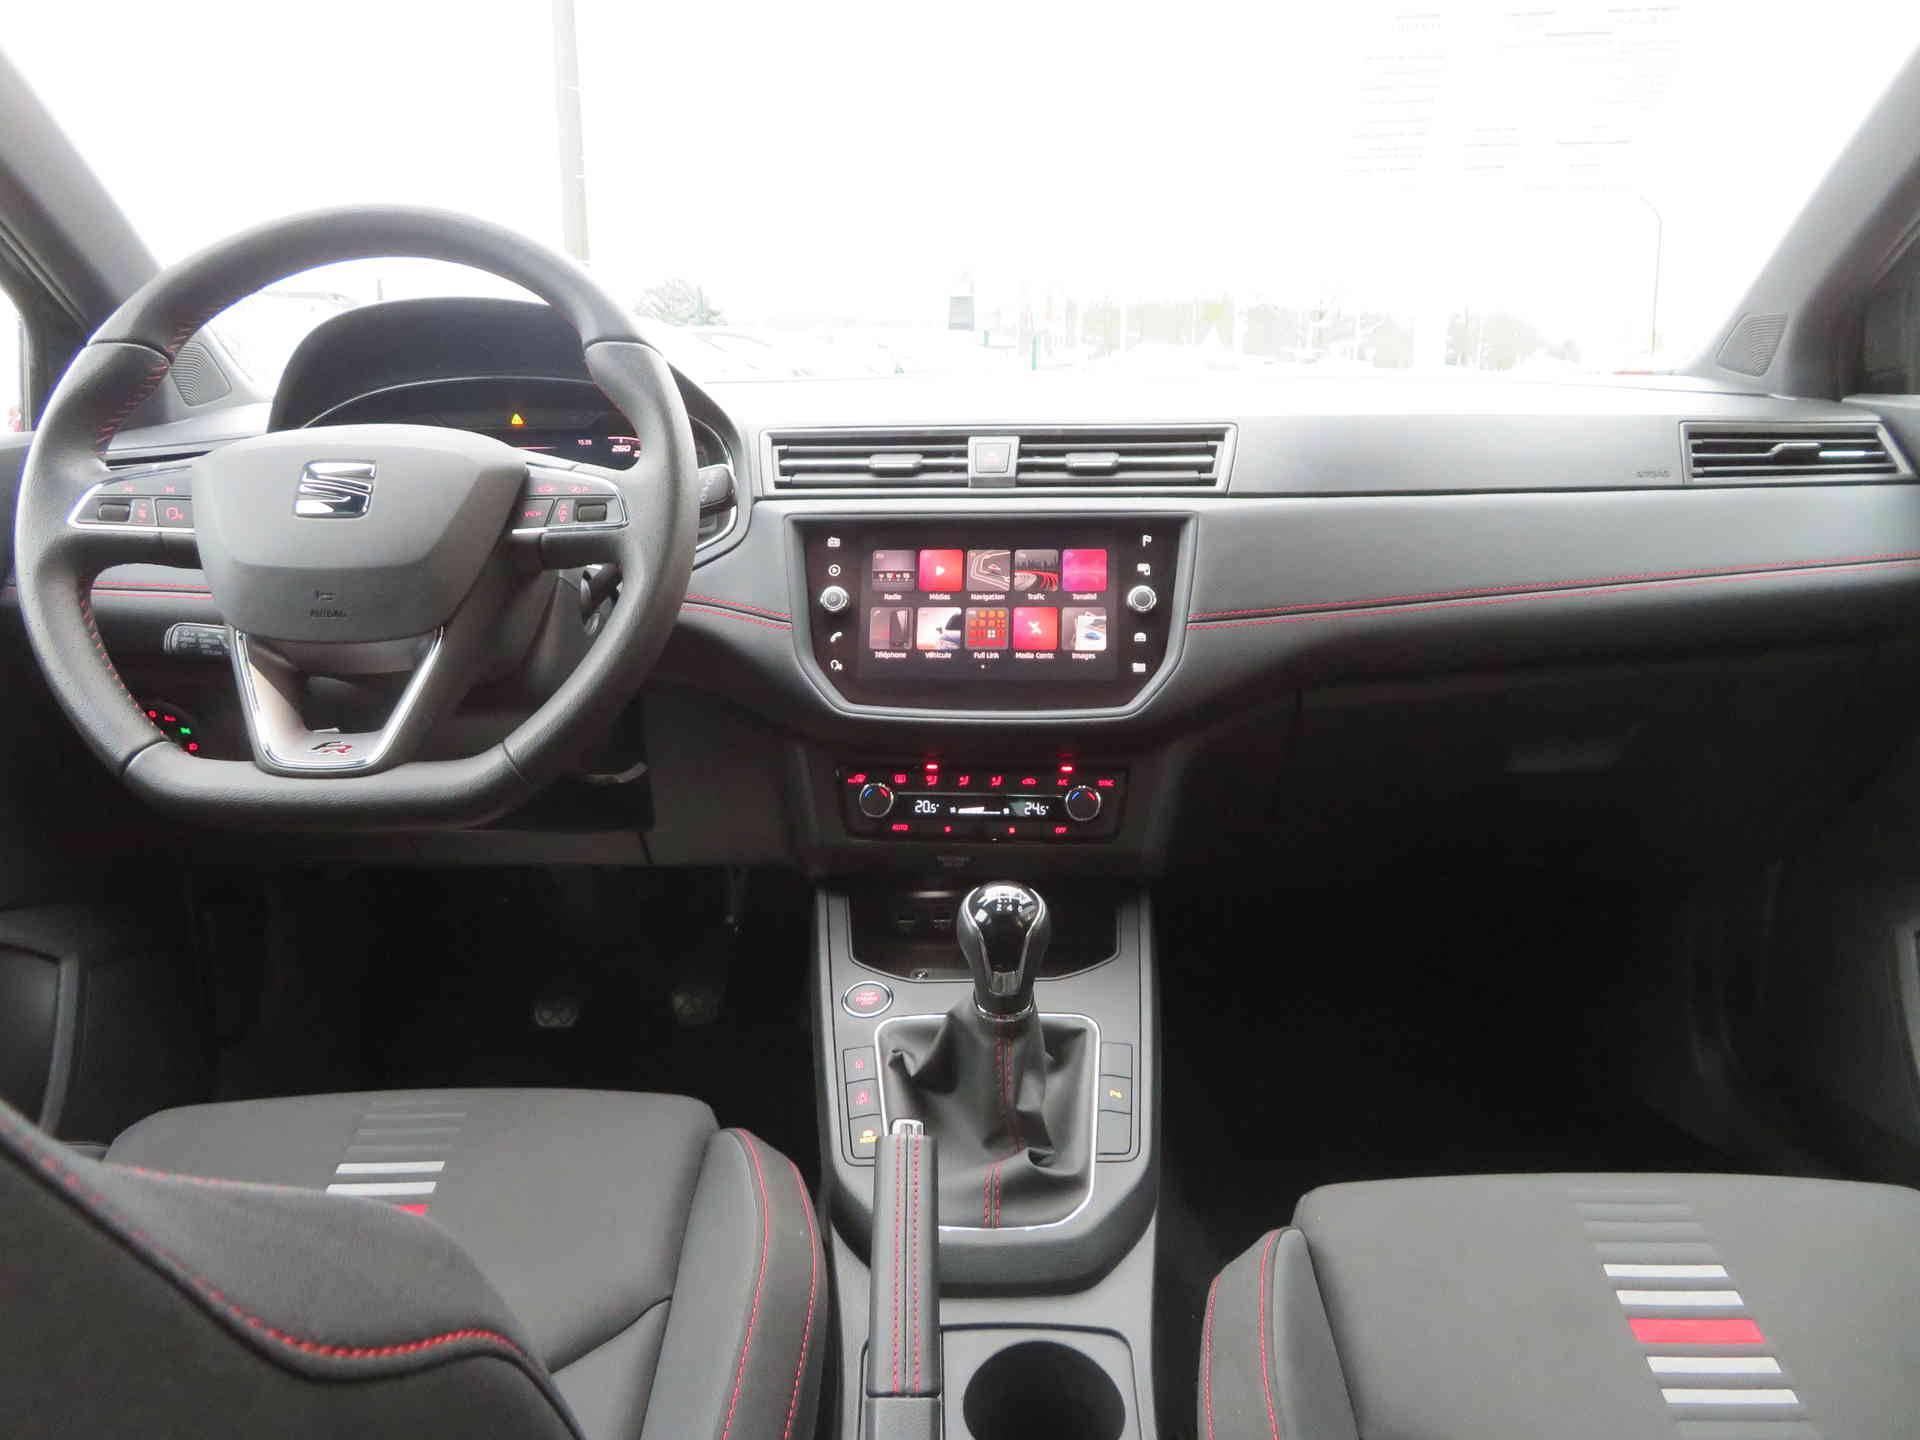 11 - Ibiza 1.0 EcoTSI 115 ch S/S BVM6